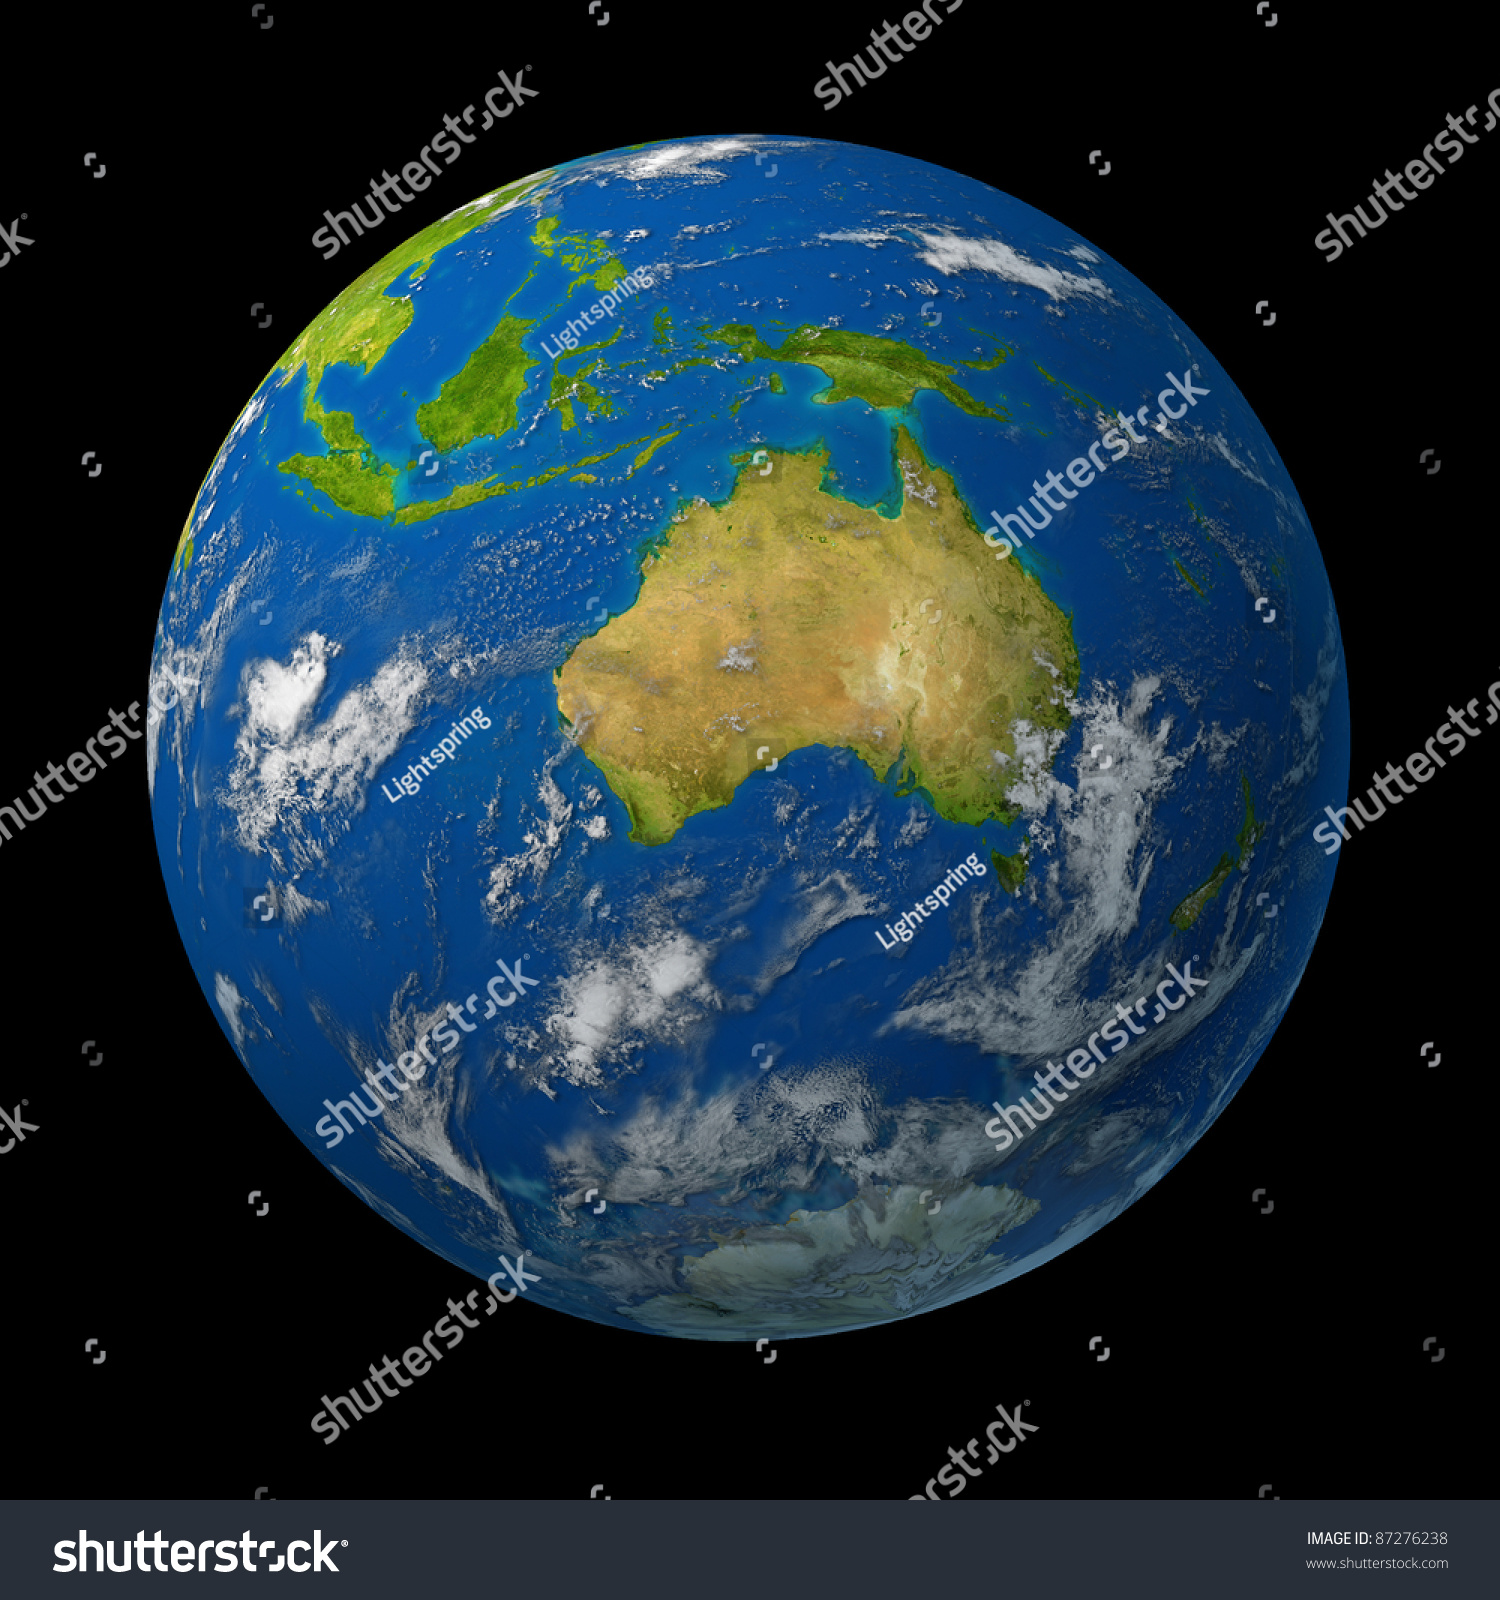 Australia On Earth Globe Representing Australian – Melbourne Australia World Map